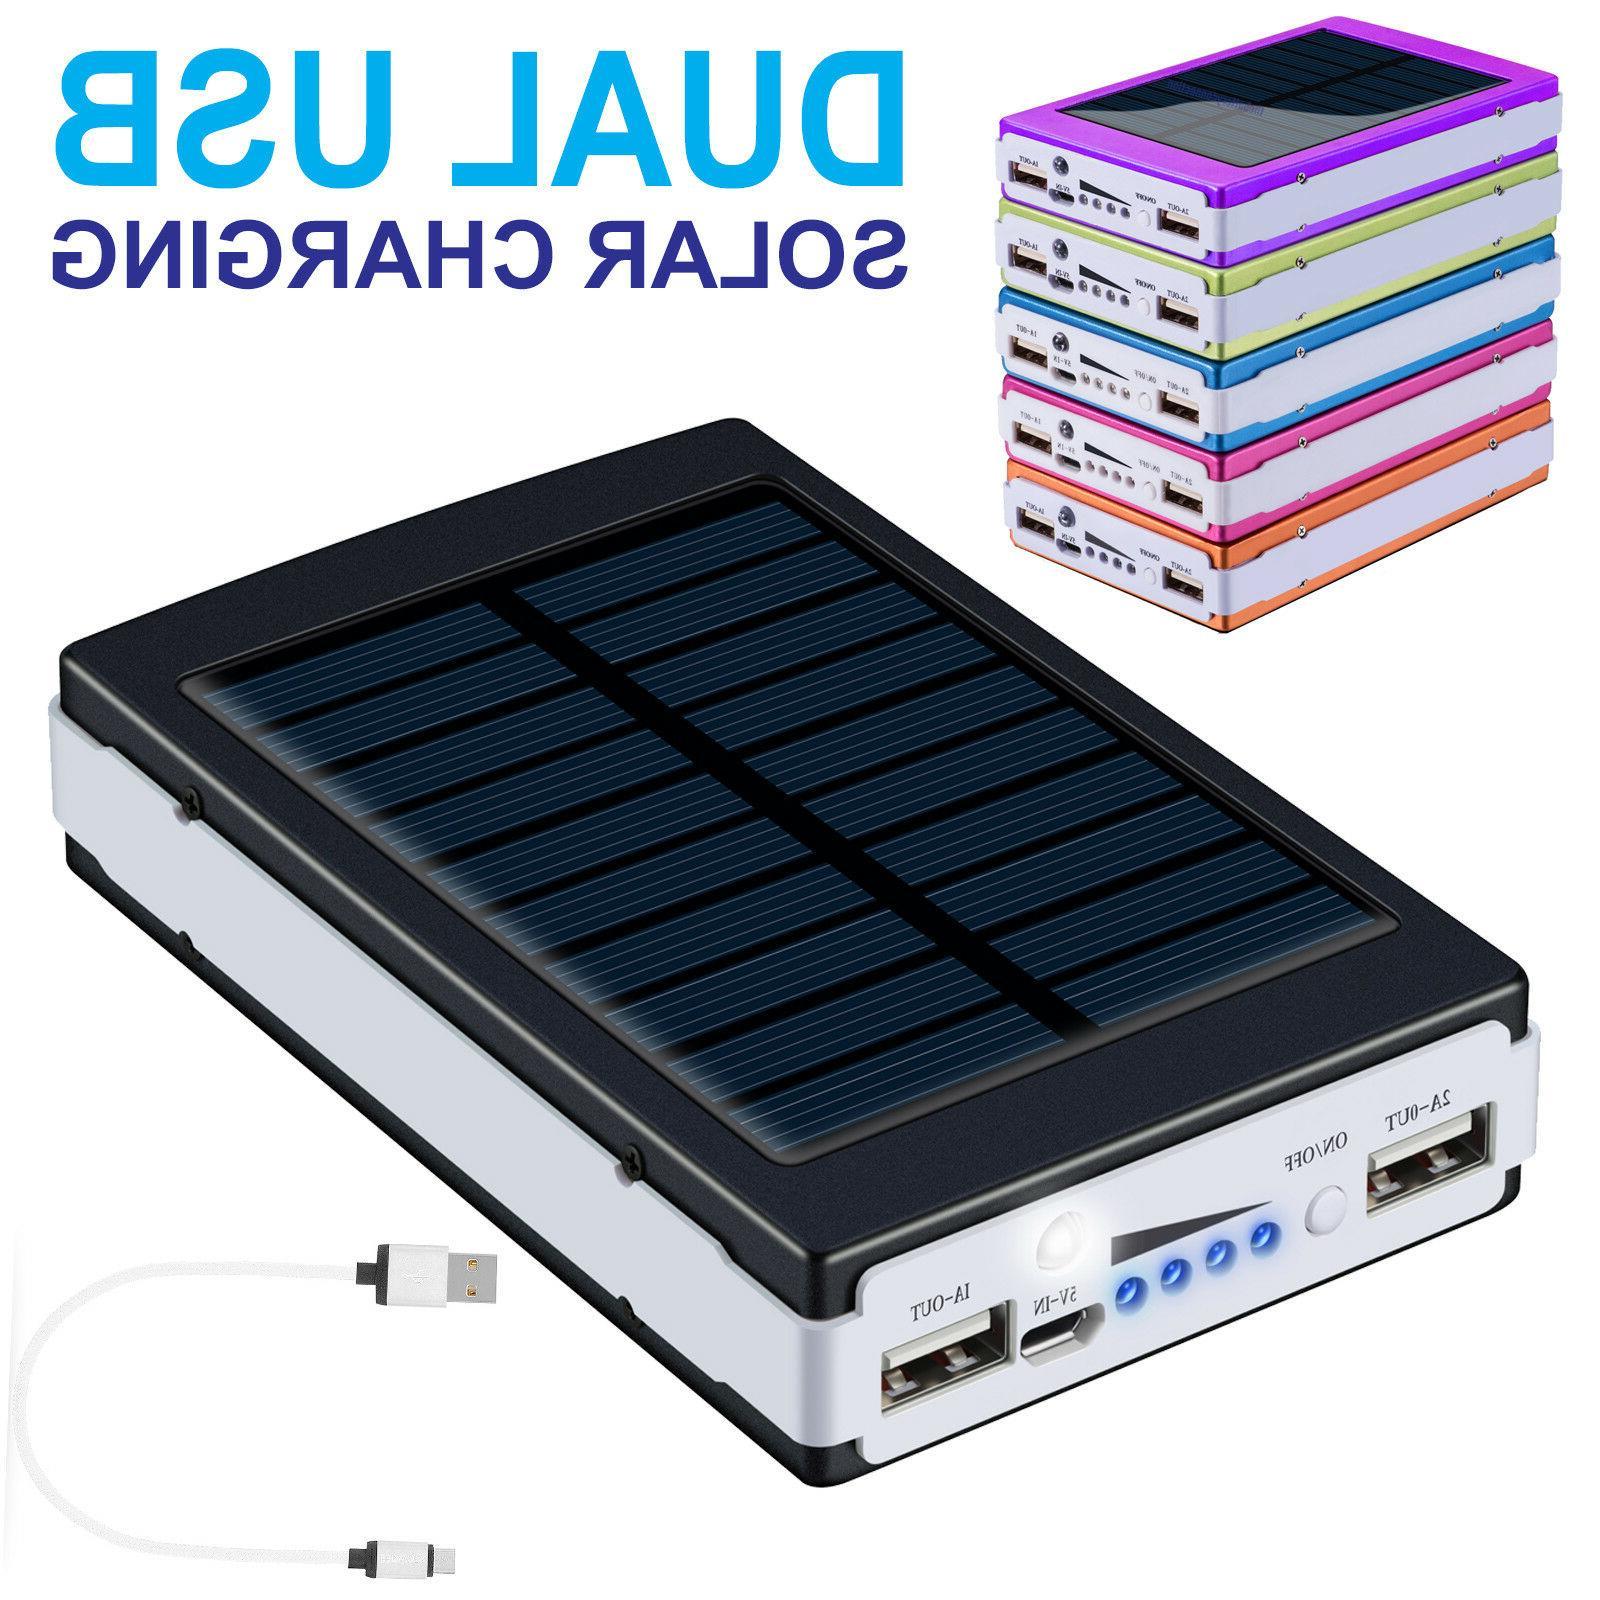 900000mah dual usb portable power bank external